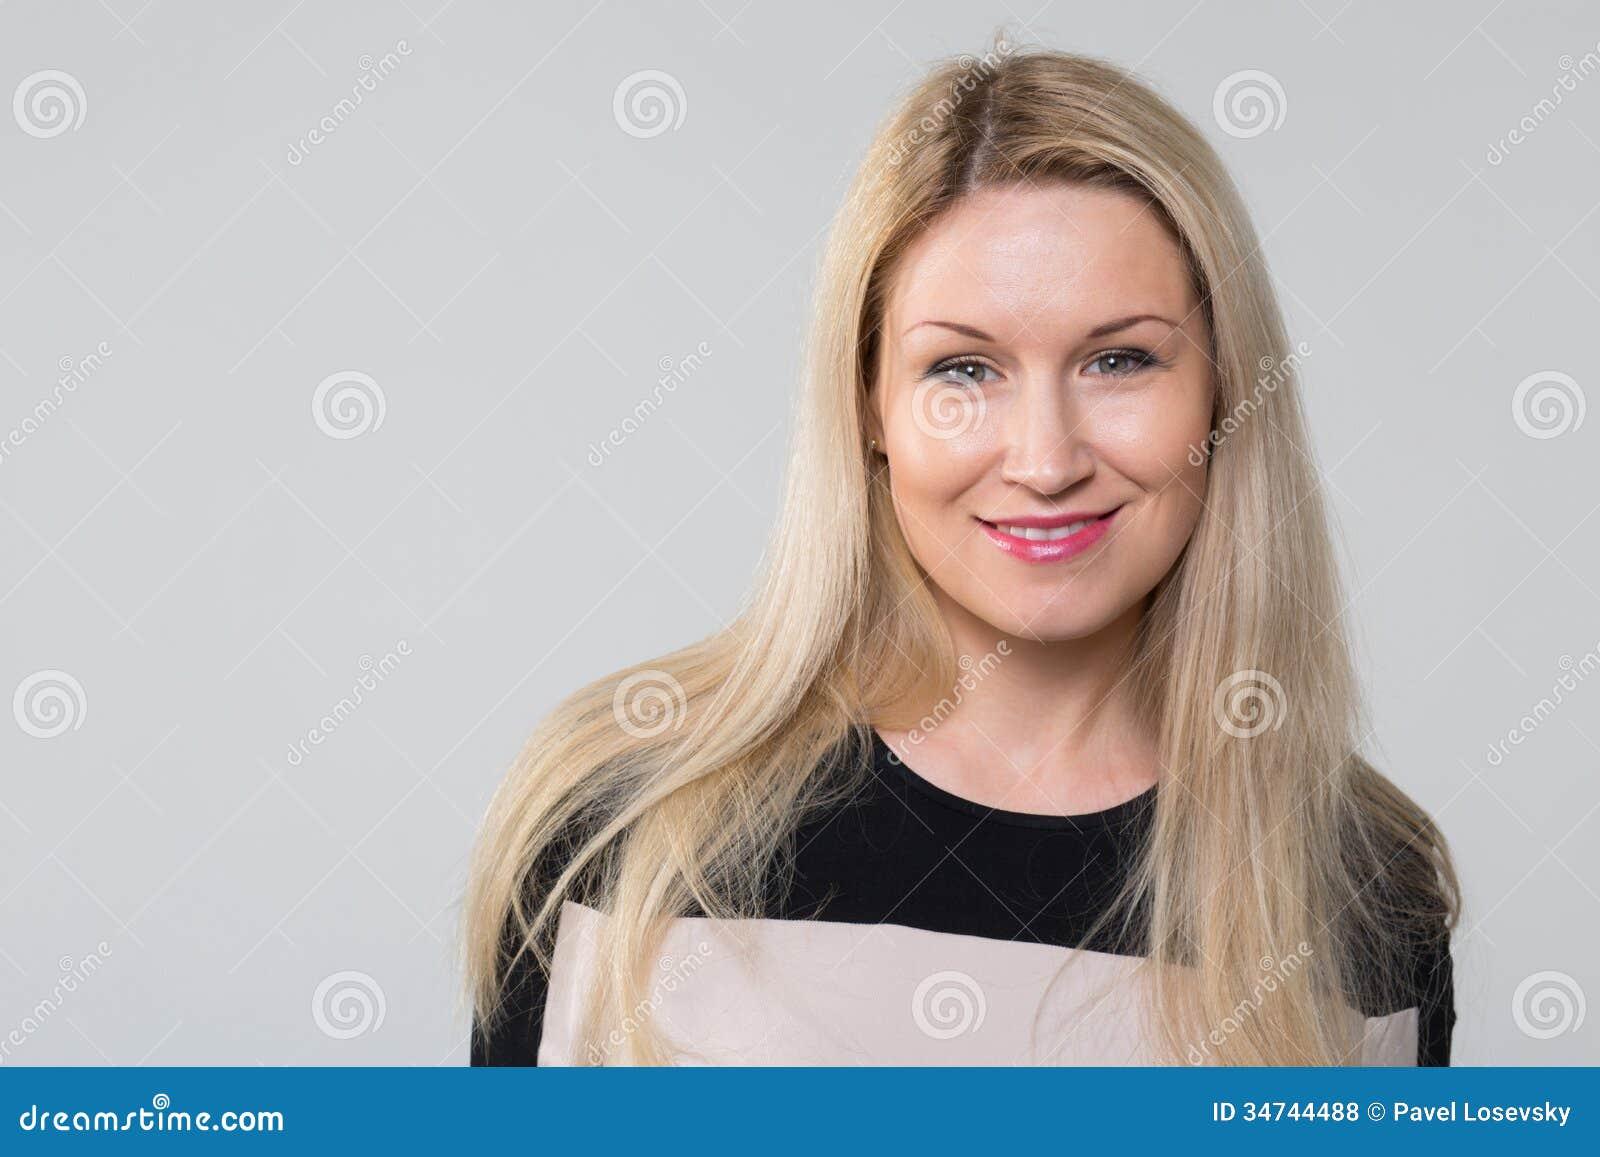 Closeup portrait of a beautiful smiling girl